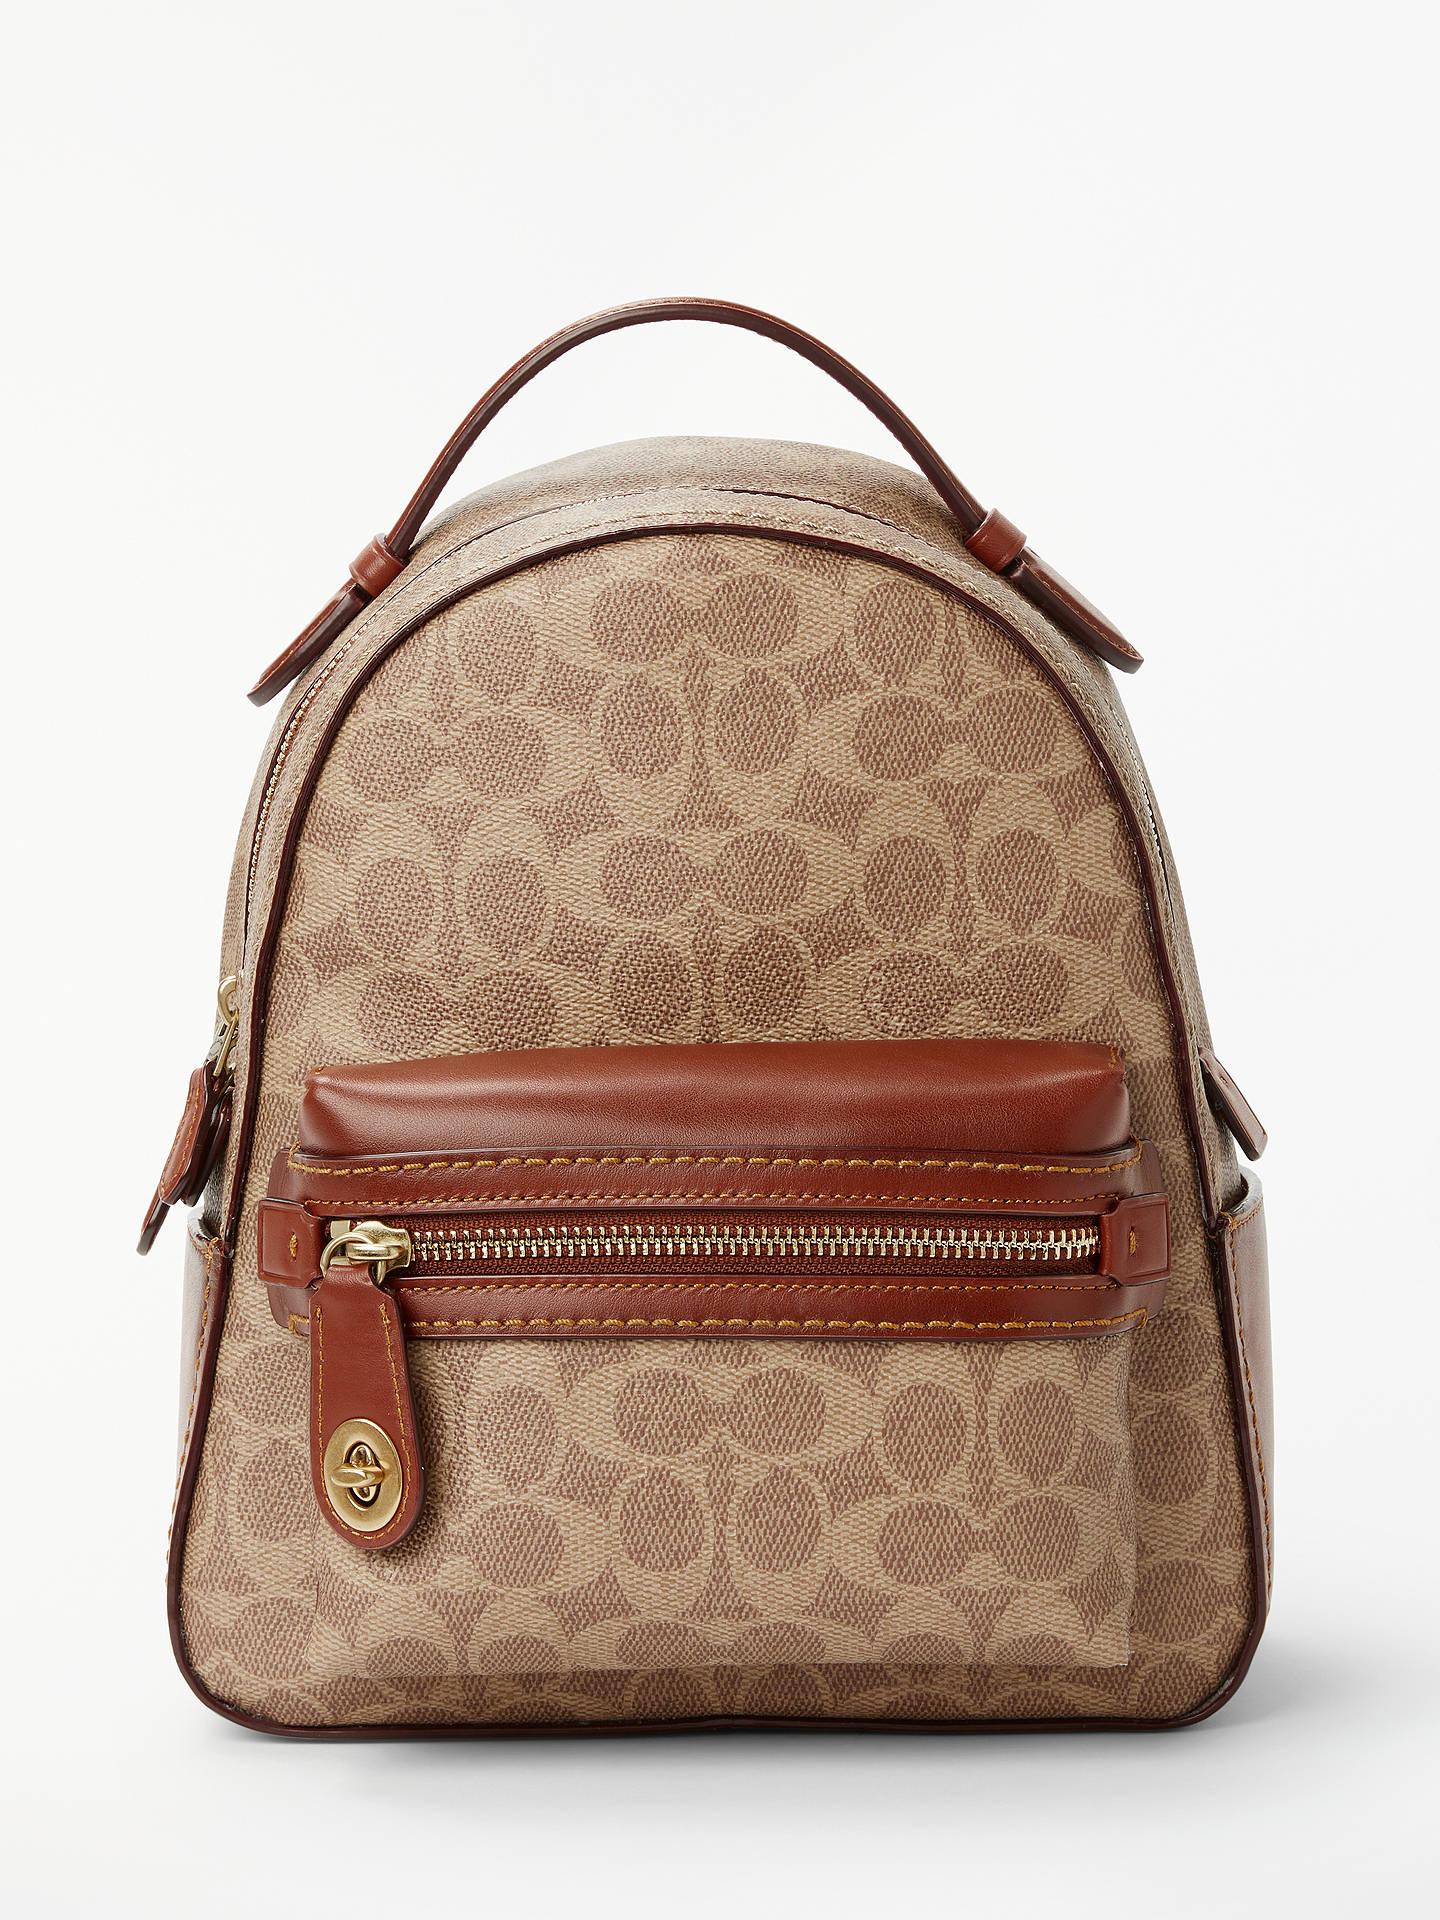 ea44974fd Buy Coach Signature Campus Backpack, Tan Rust Online at johnlewis.com ...